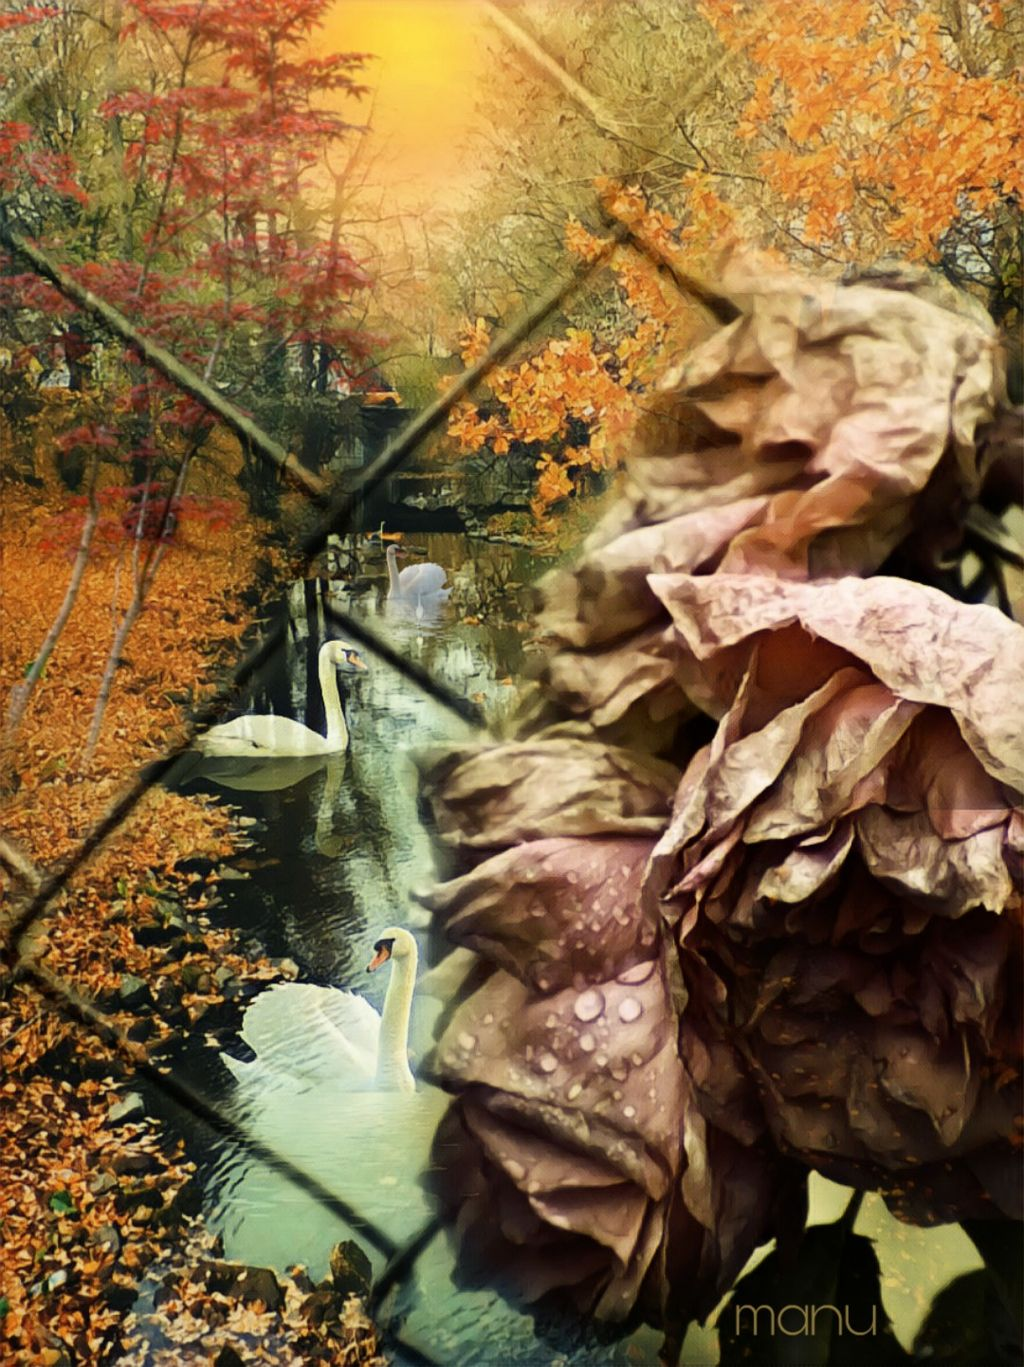 #freetoedit #myedit #doubleexposure #autumn #landscape #flowers #swans #fantasy #imagination #